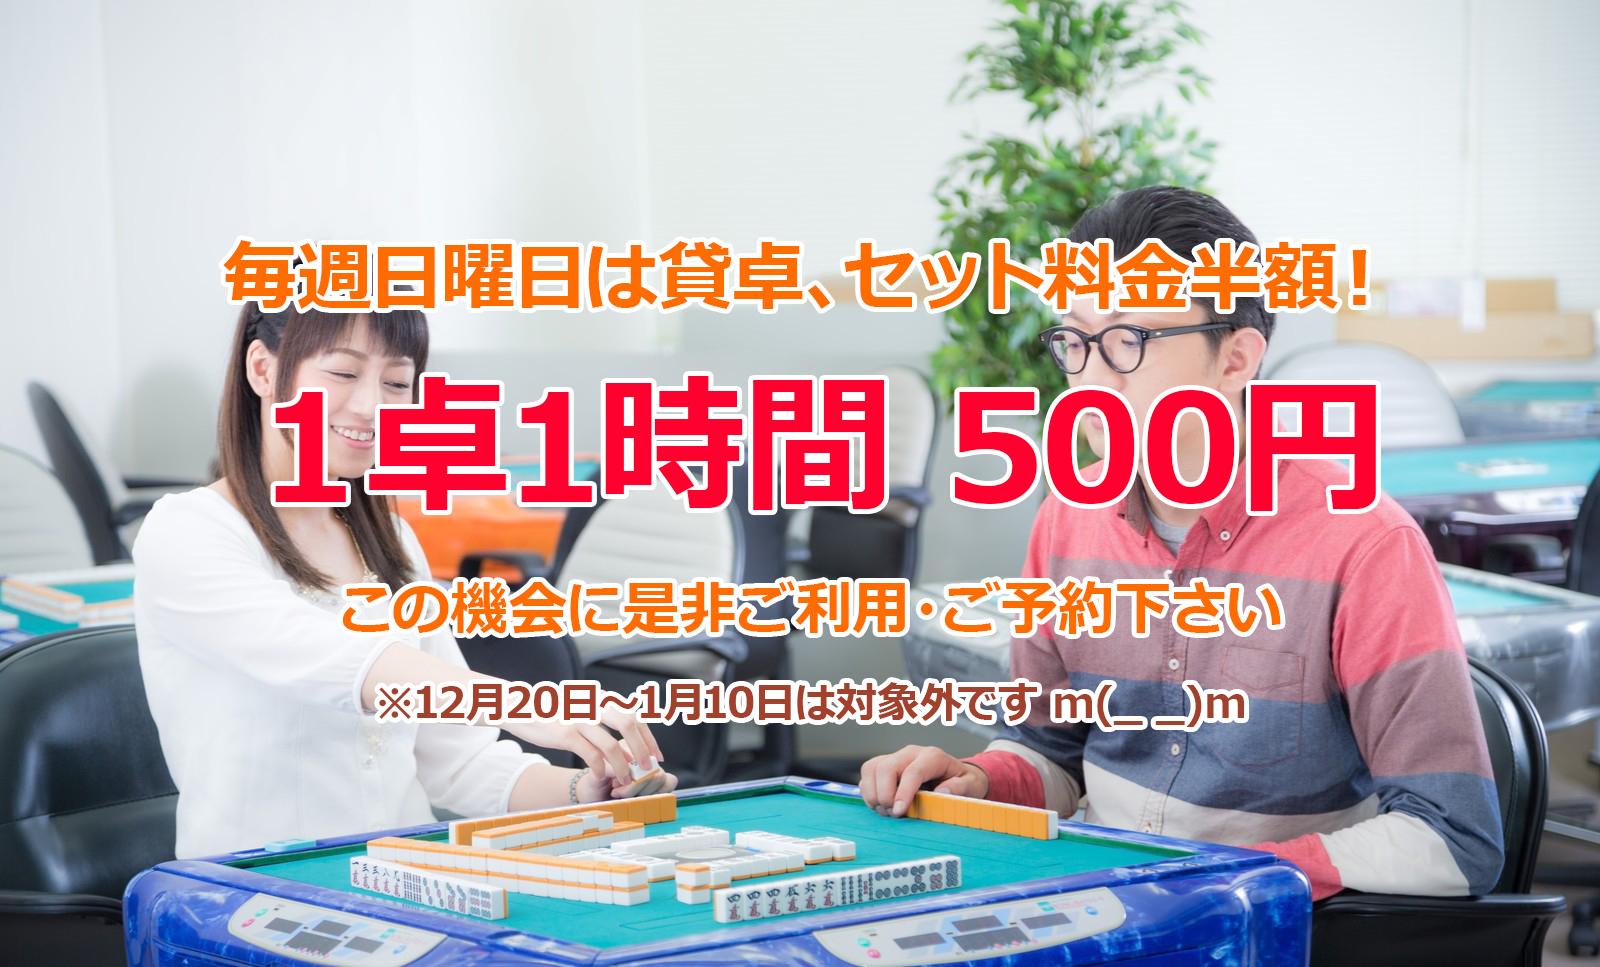 毎週日曜日は貸卓・セット料金半額 1卓1時間500円!